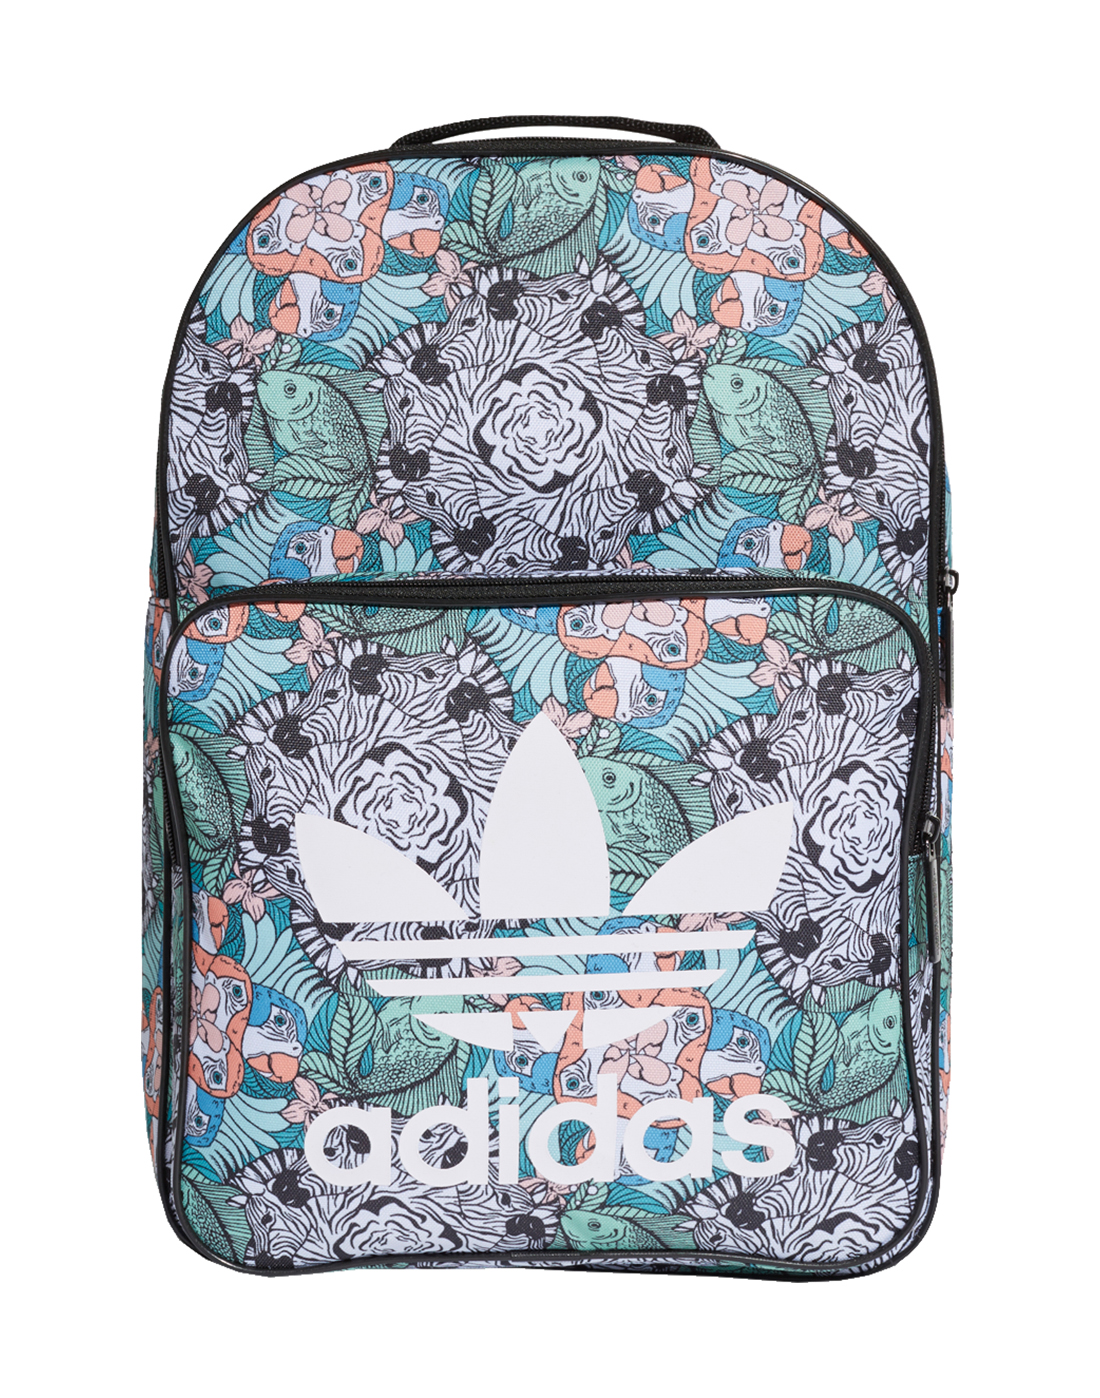 49aa796cb4 adidas Originals. Animal Print Backpack. Animal Print Backpack · Animal  Print Backpack